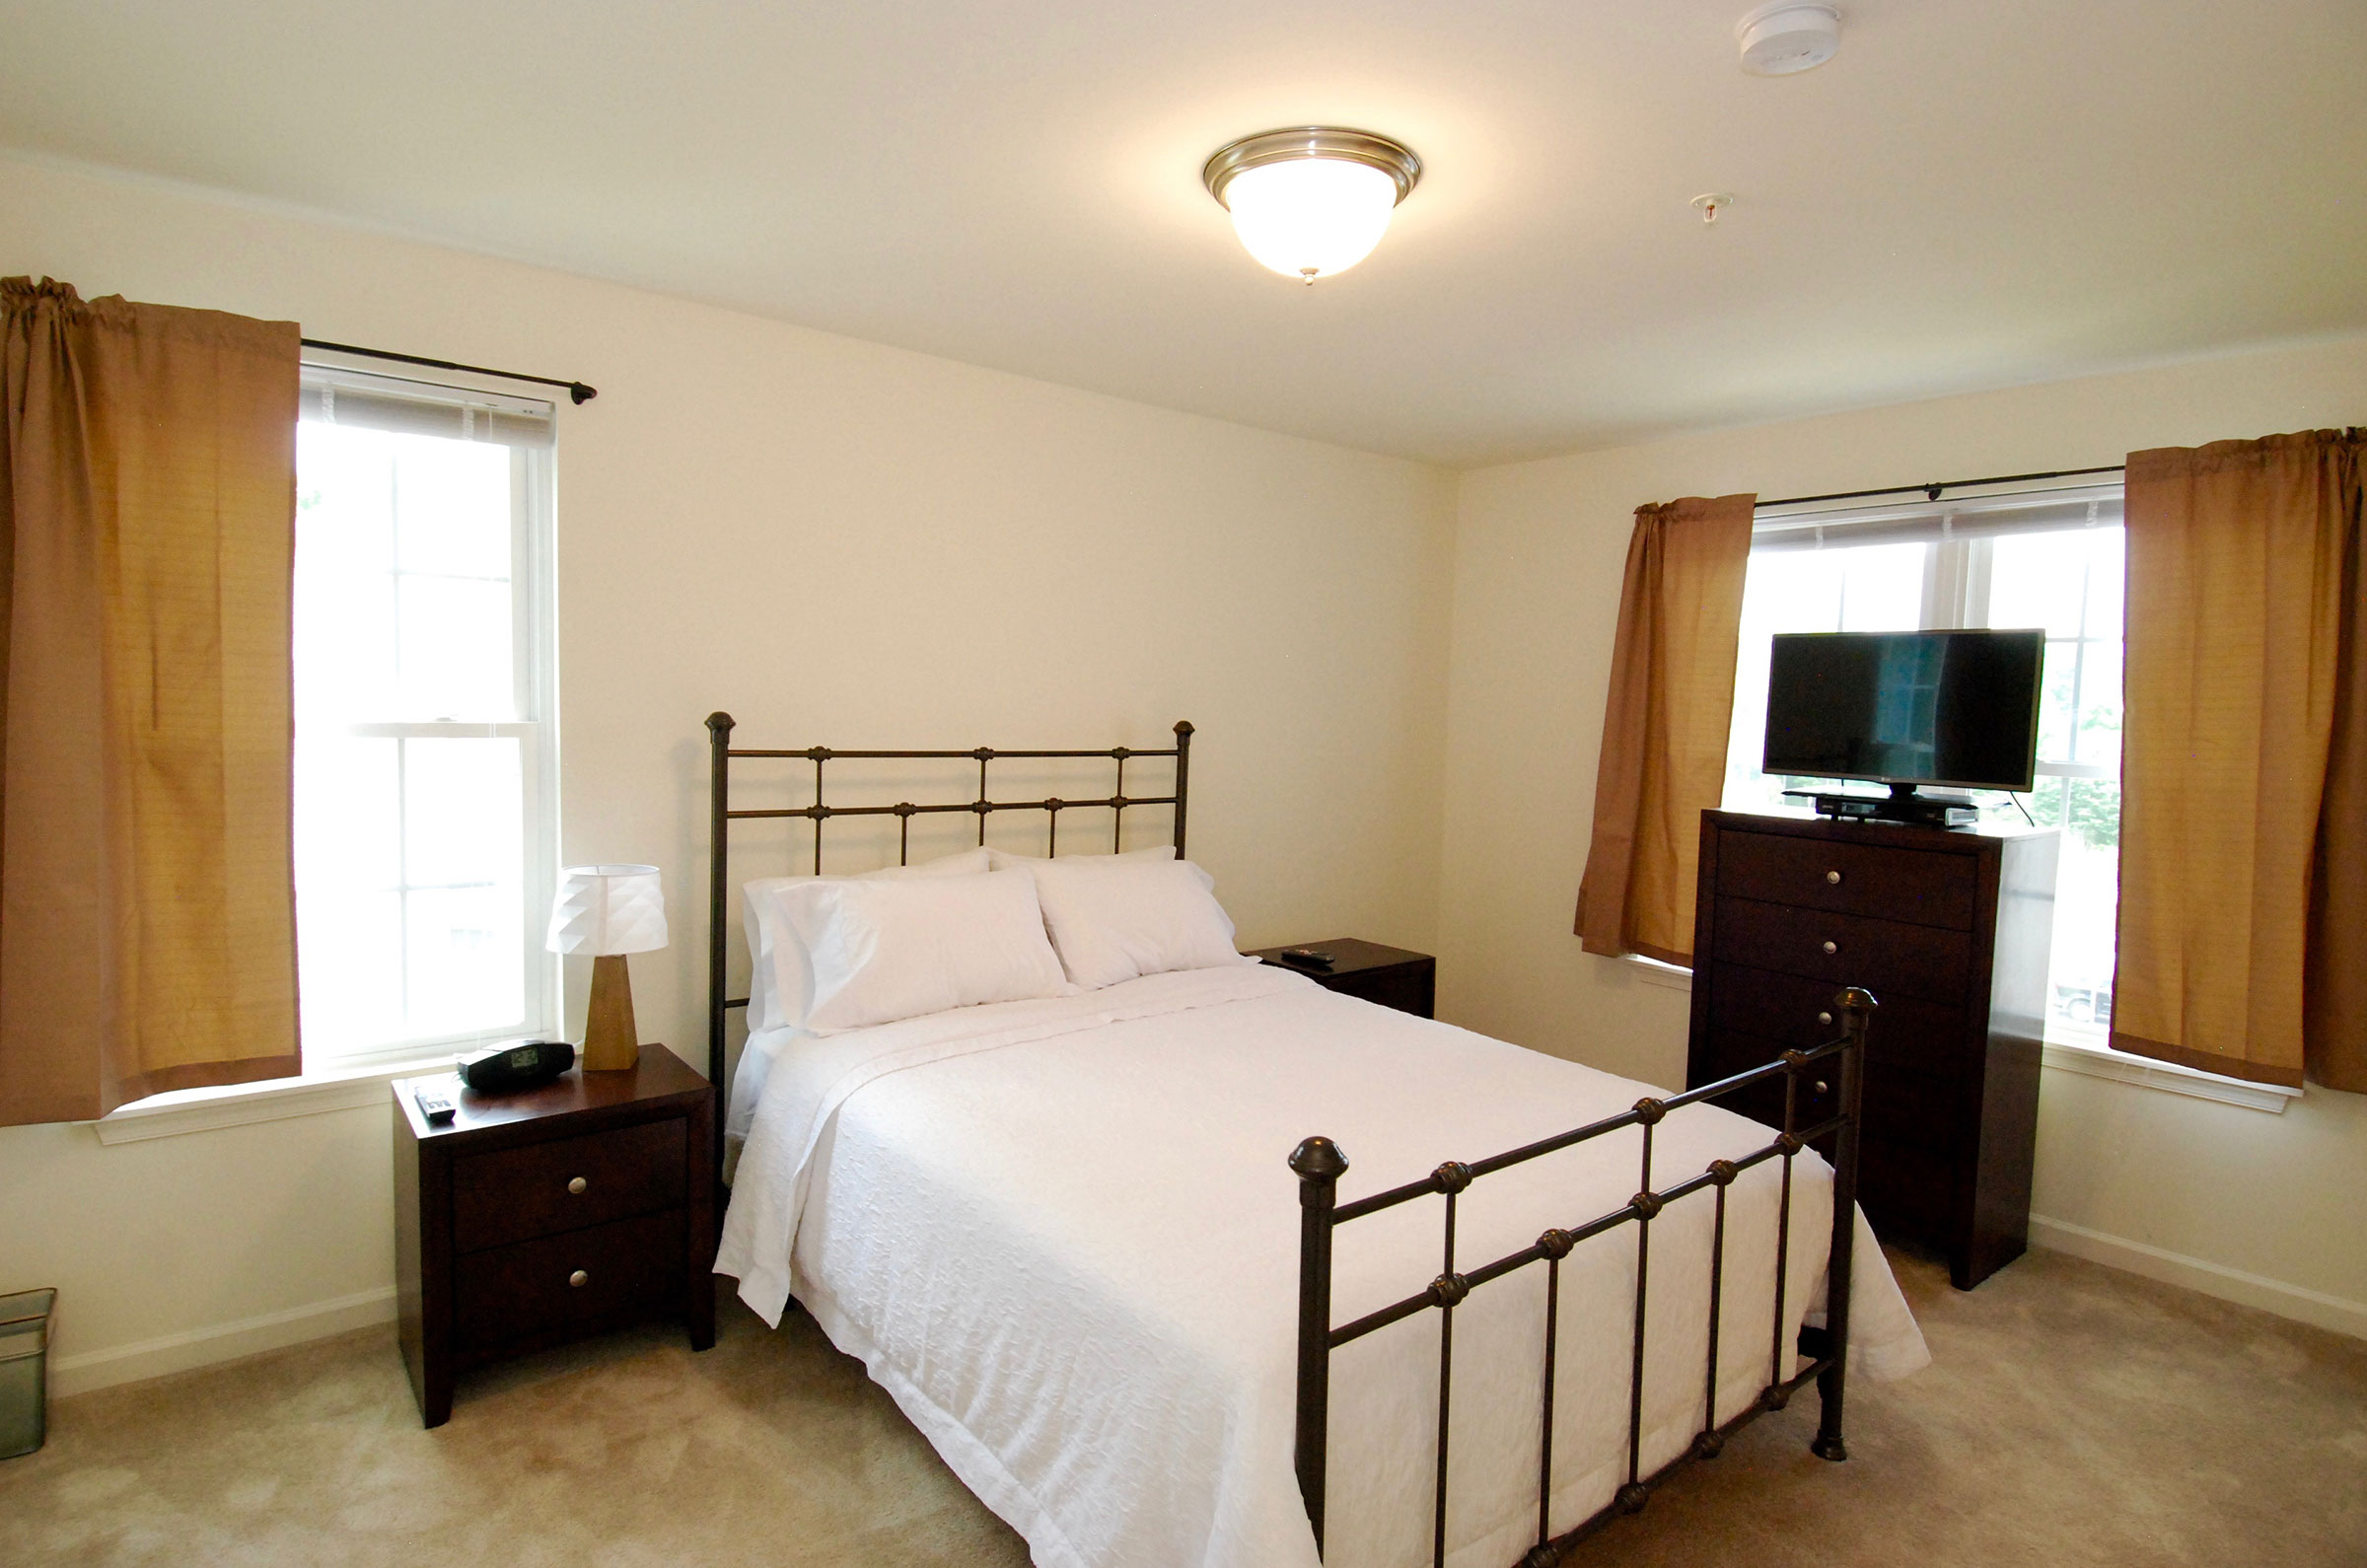 corporate apt master bedroom